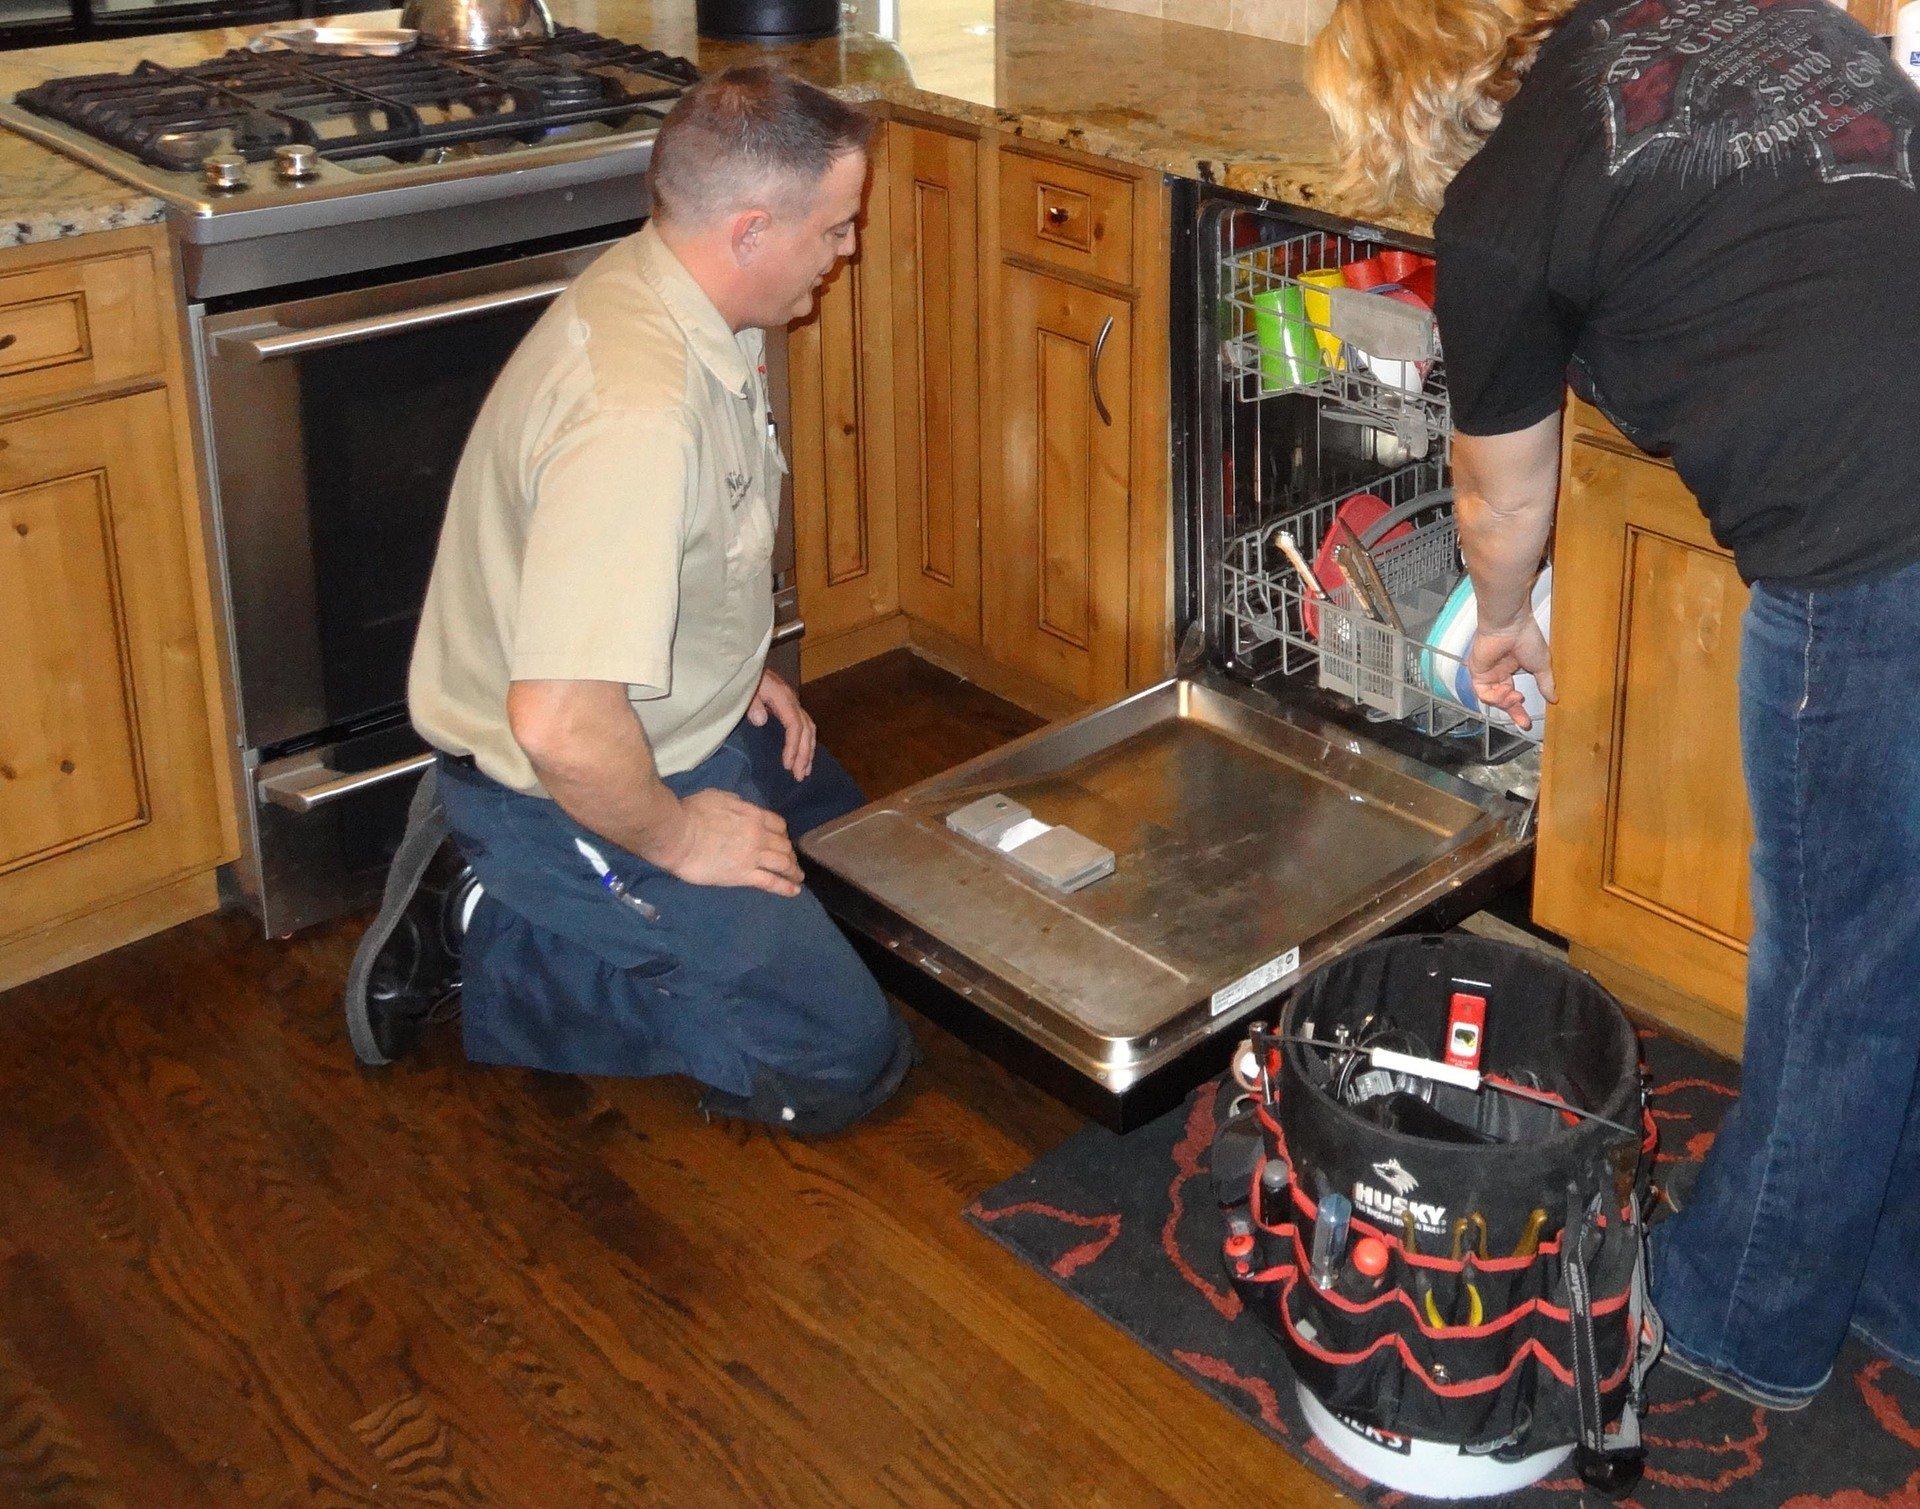 Dishwasher Repair, Johnson County Dishwasher Repair, Shawnee Dishwasher Repair, Desoto Dishwasher Repair, Leawood Dishwasher Repair, Merriam Dishwasher Repair, Overland Park Dishwasher Repair, Prairie Village Dishwasher Repair, Olathe Dishwasher Repair, MIssion Dishwasher Repair, Gardner Dishwasher Repair